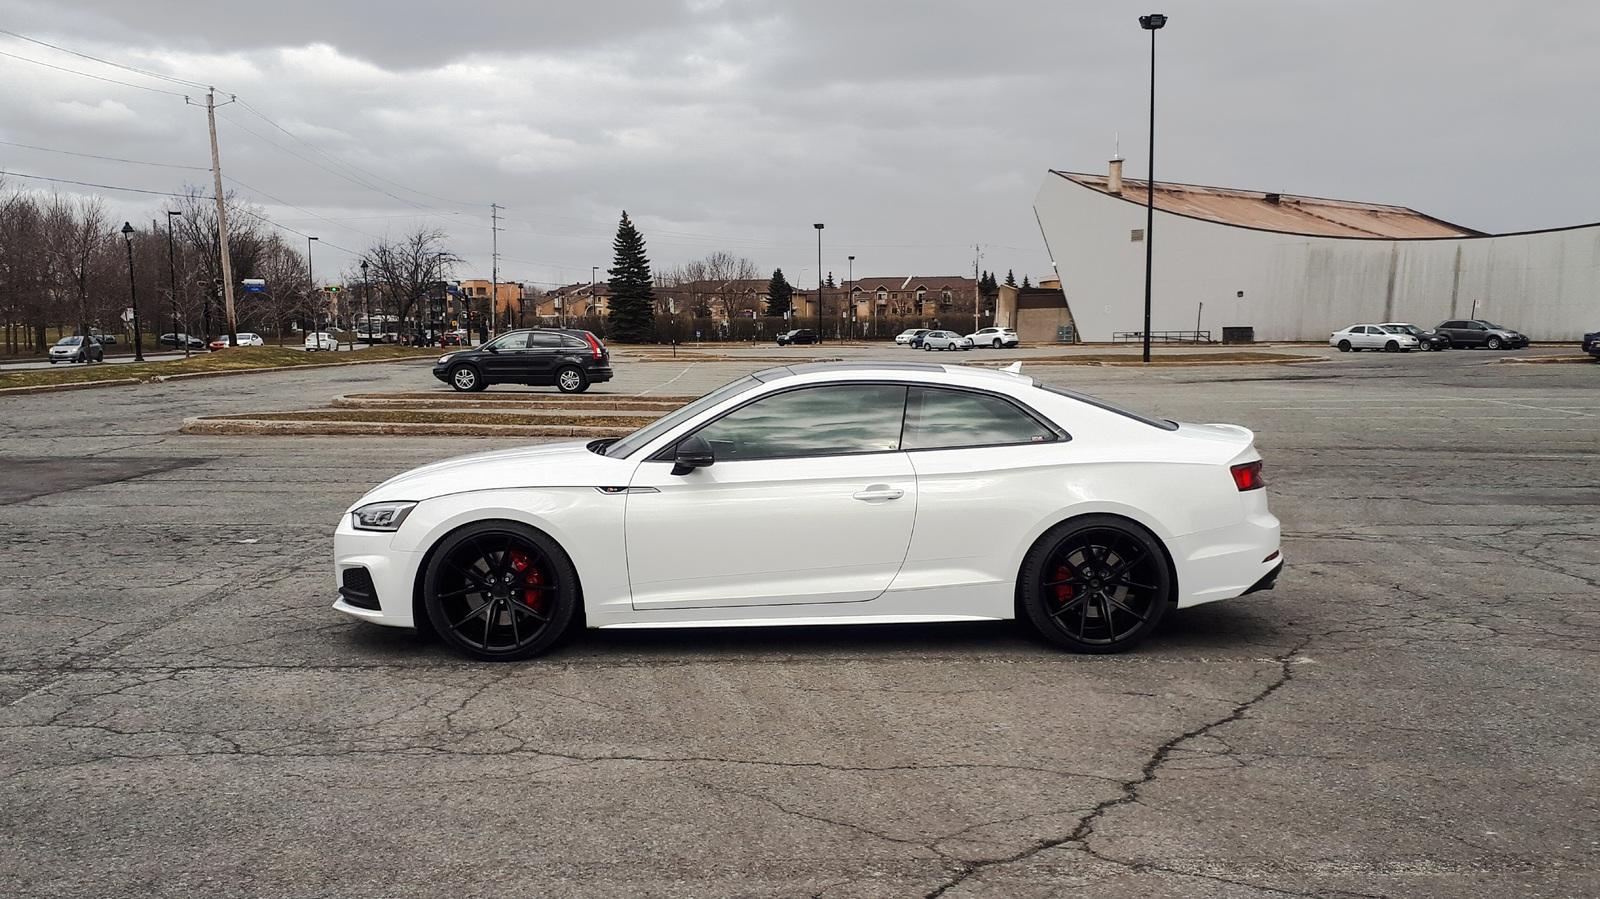 2018 Audi S5 Coupe 1 4 Mile Drag Racing Timeslip Specs 0 60 Dragtimes Com